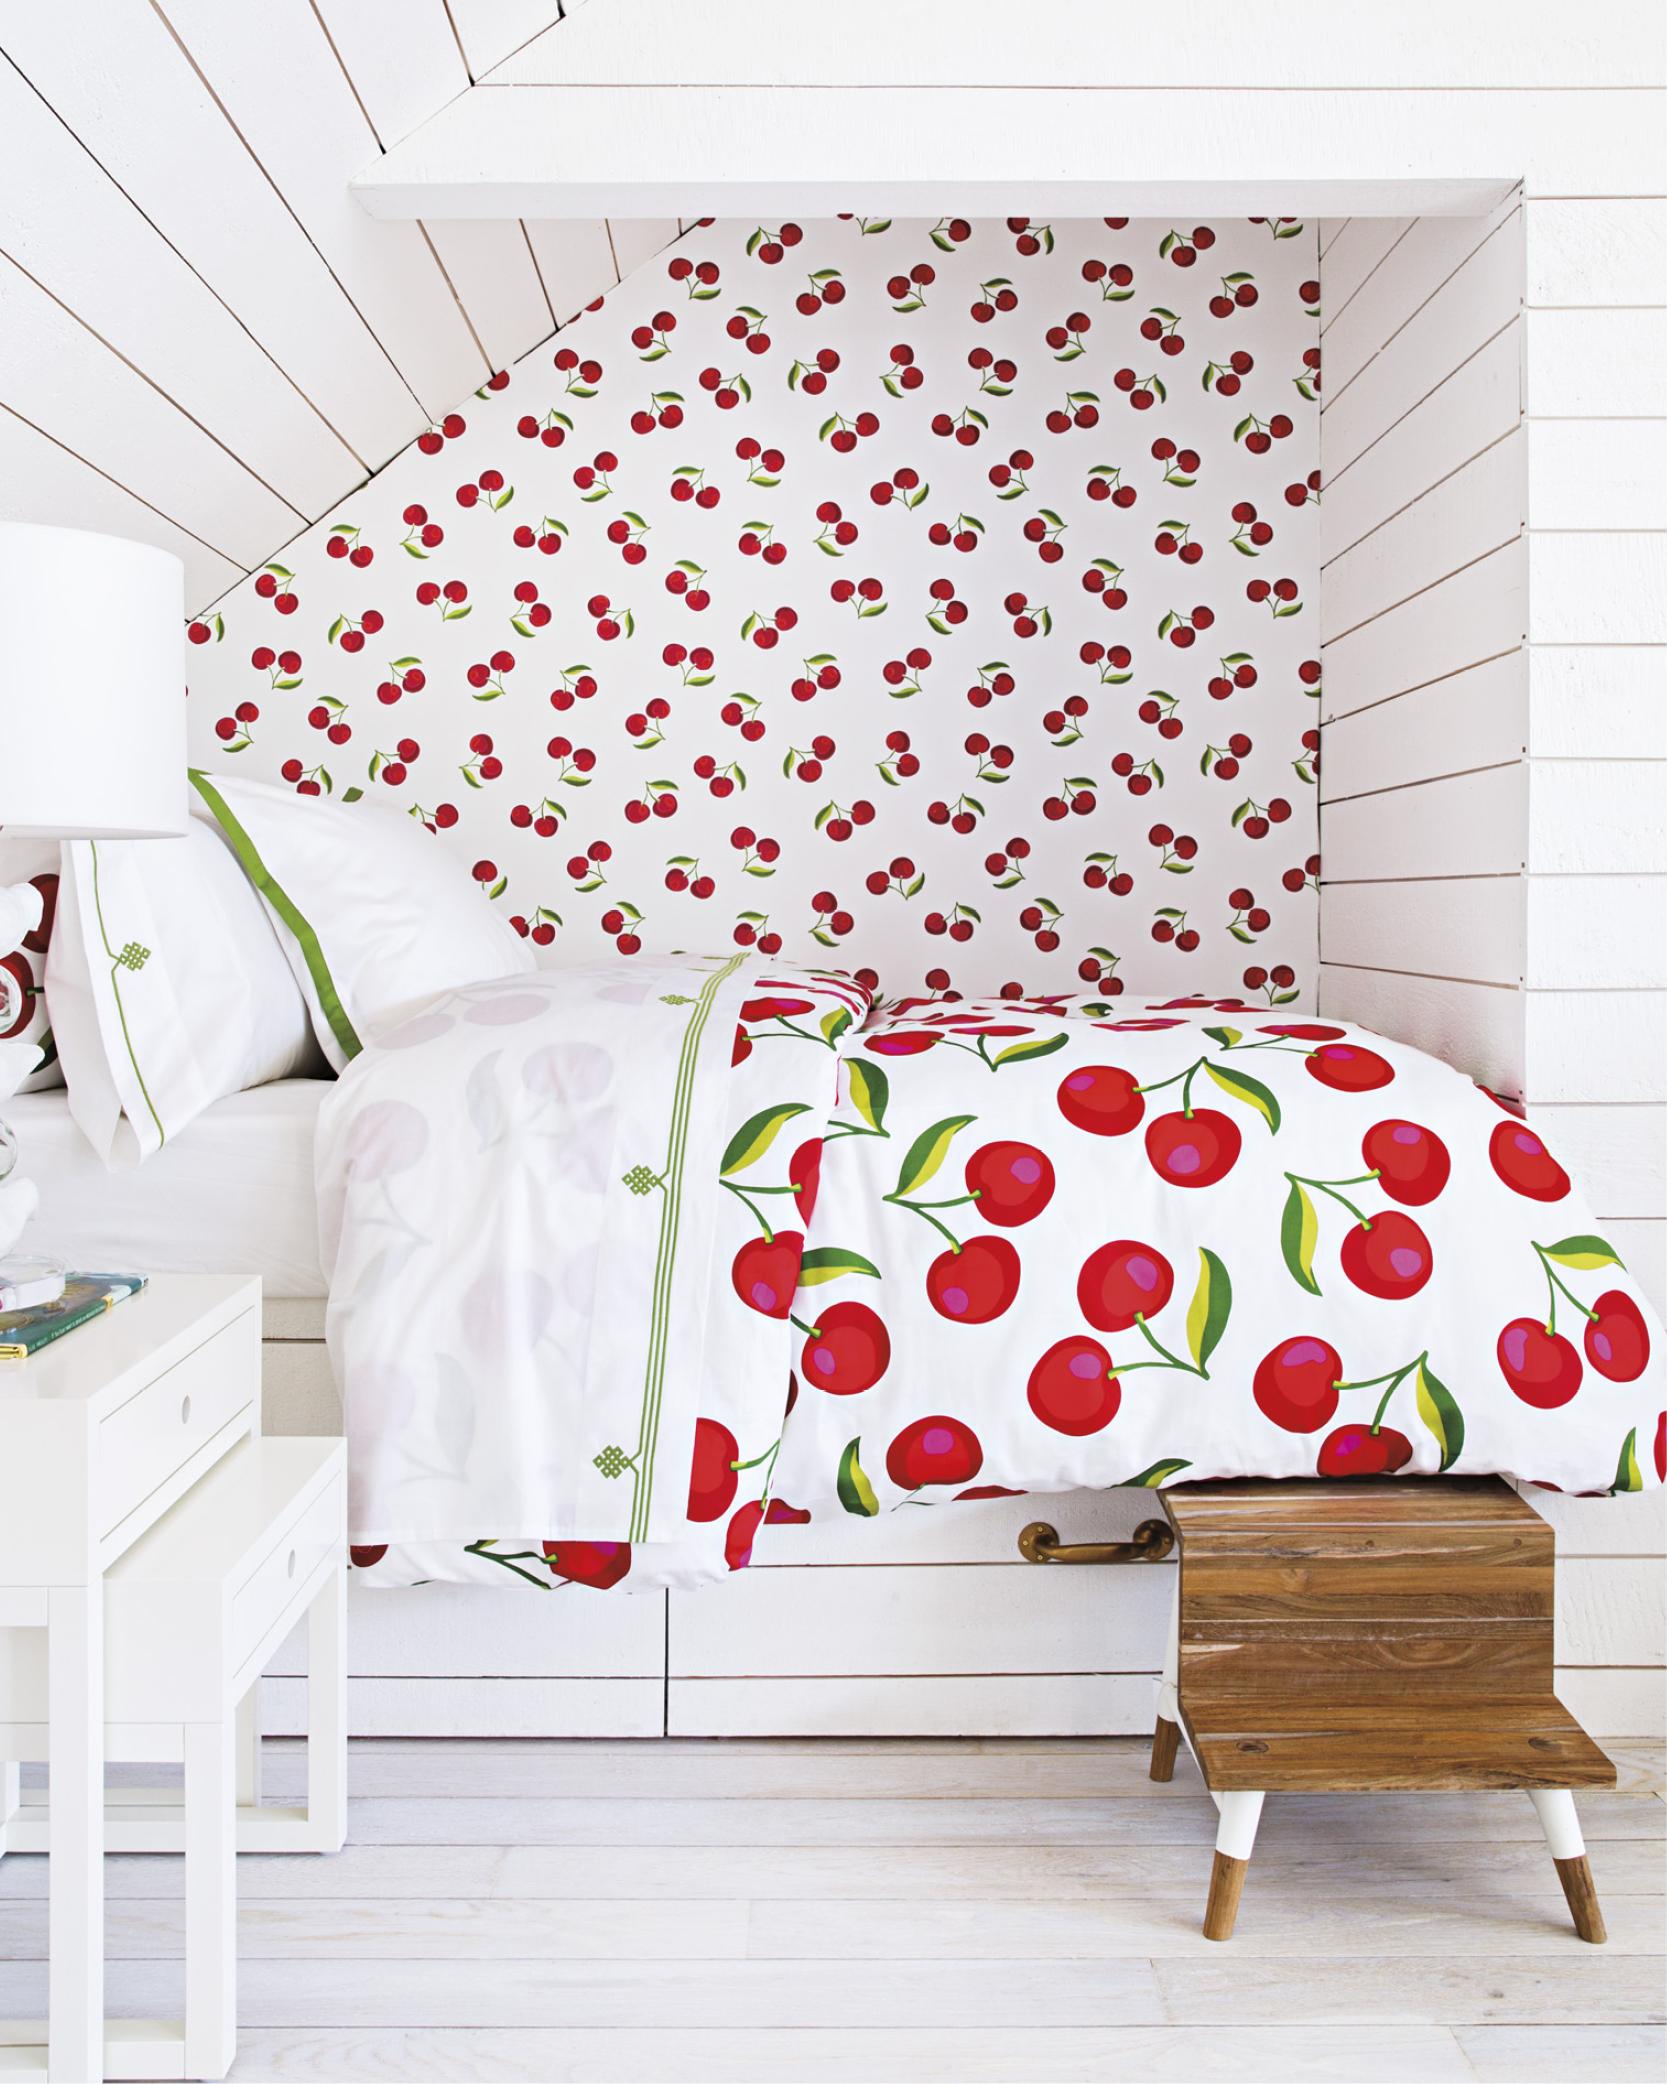 Cherries bedding and wallpaper shown in-situ Serena & Lily store, Westport, CT